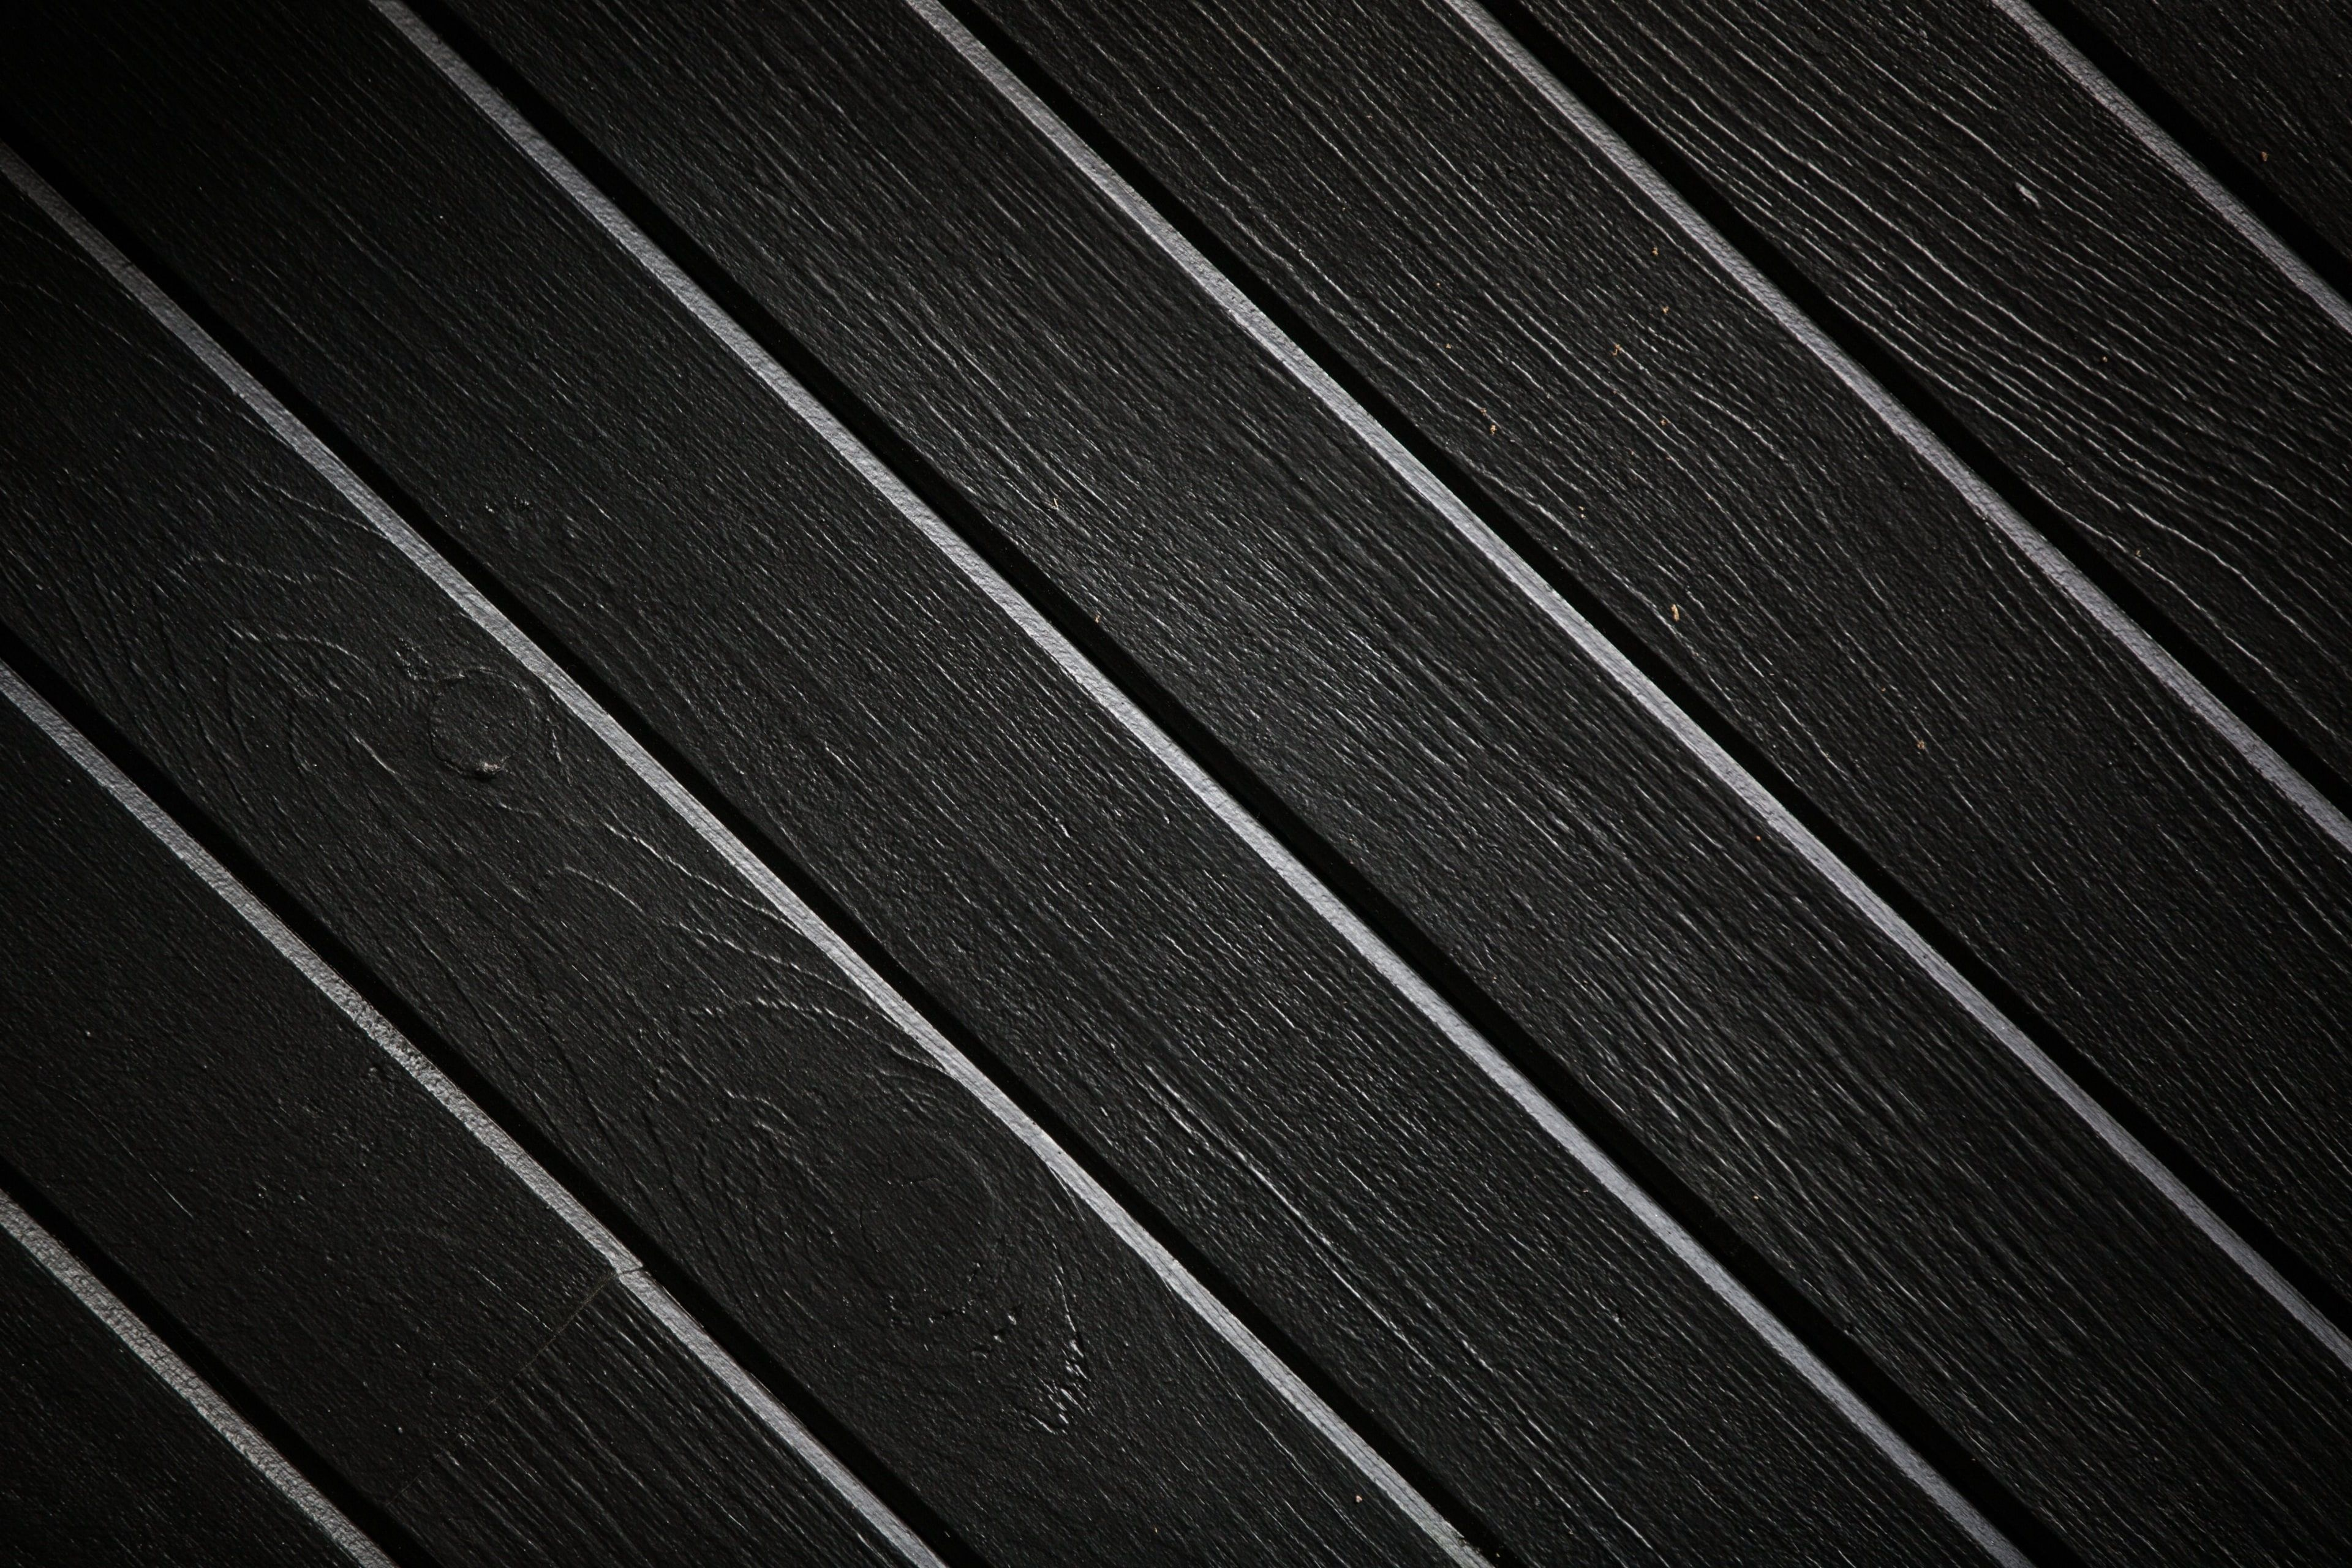 Wood 4k Background 4k Wallpaper Hdwallpaper Desktop In 2020 Black Wallpaper Dark Wood Wallpaper Wood Wallpaper